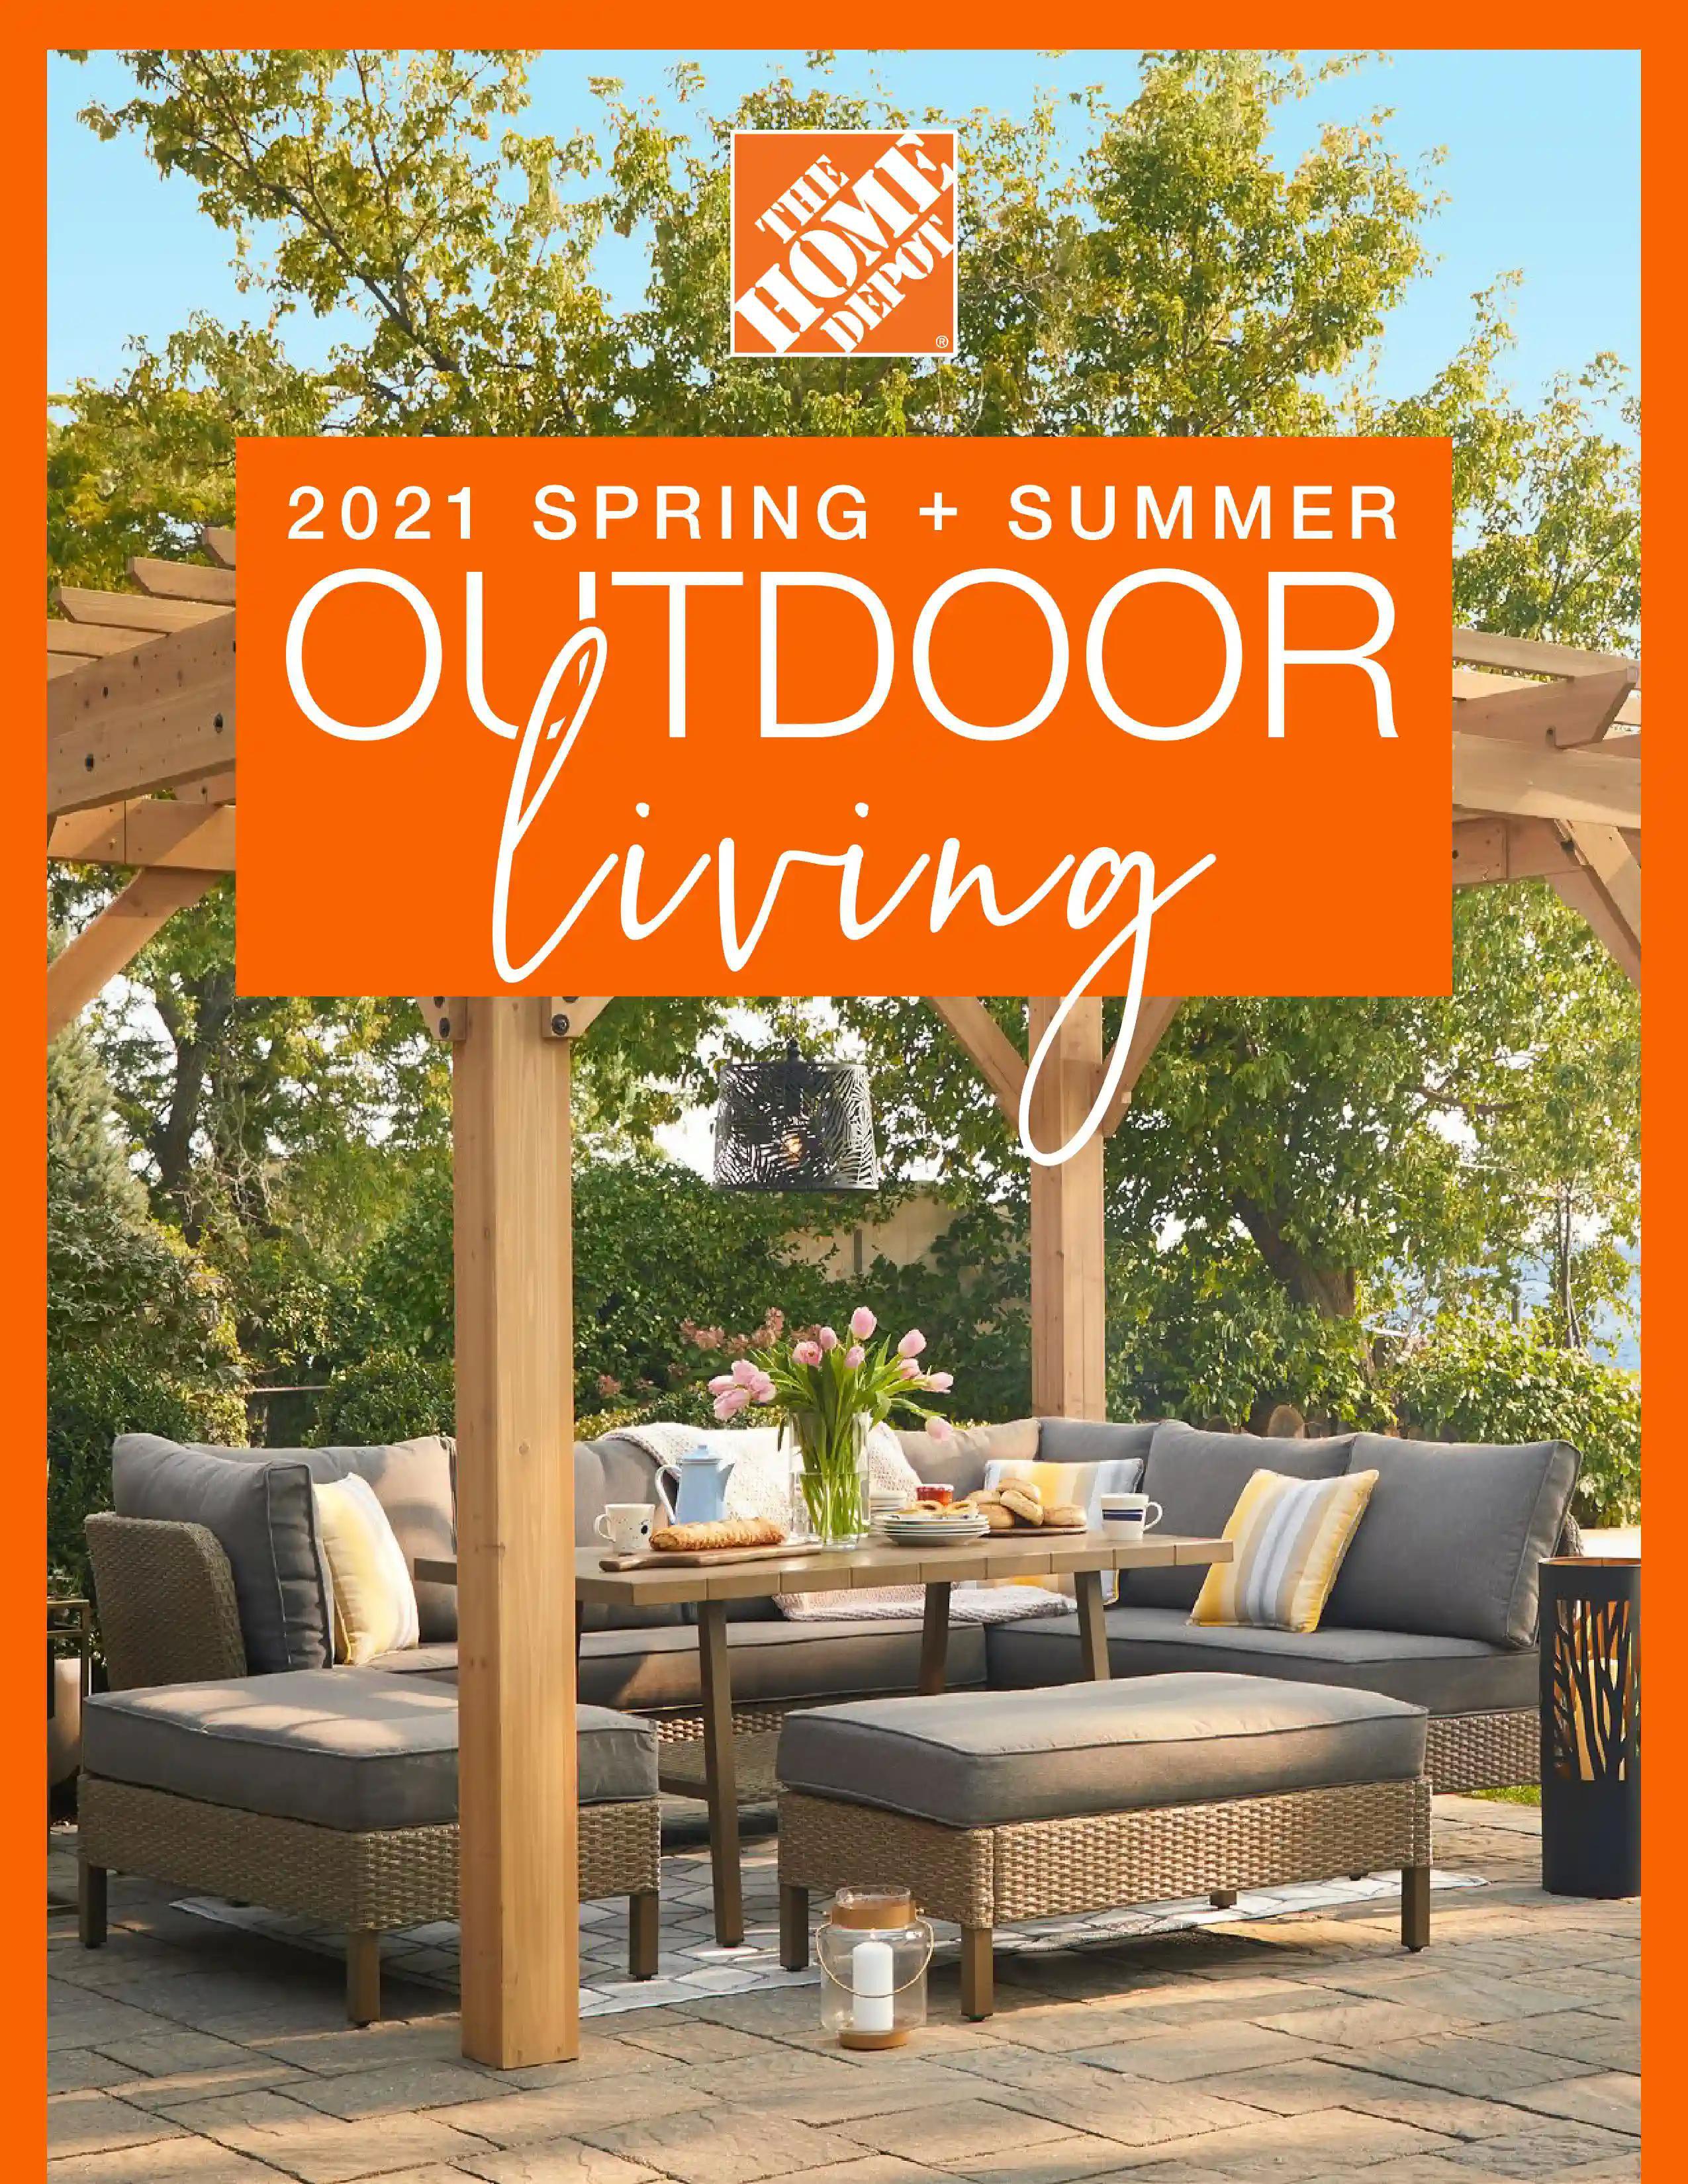 Home Depot - Outdoor Living